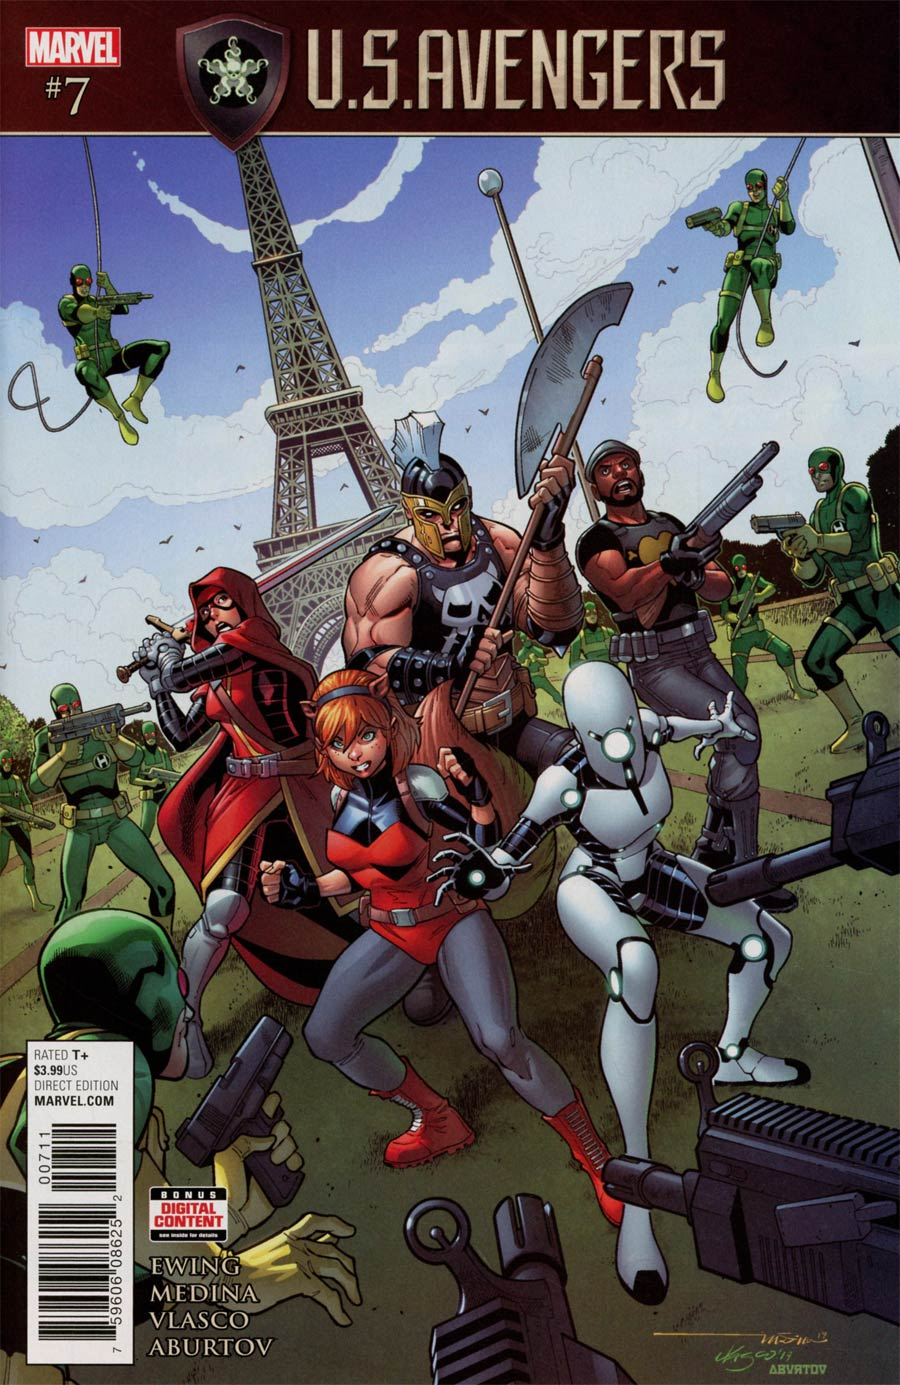 U.S.Avengers #7 (Secret Empire Tie-In)